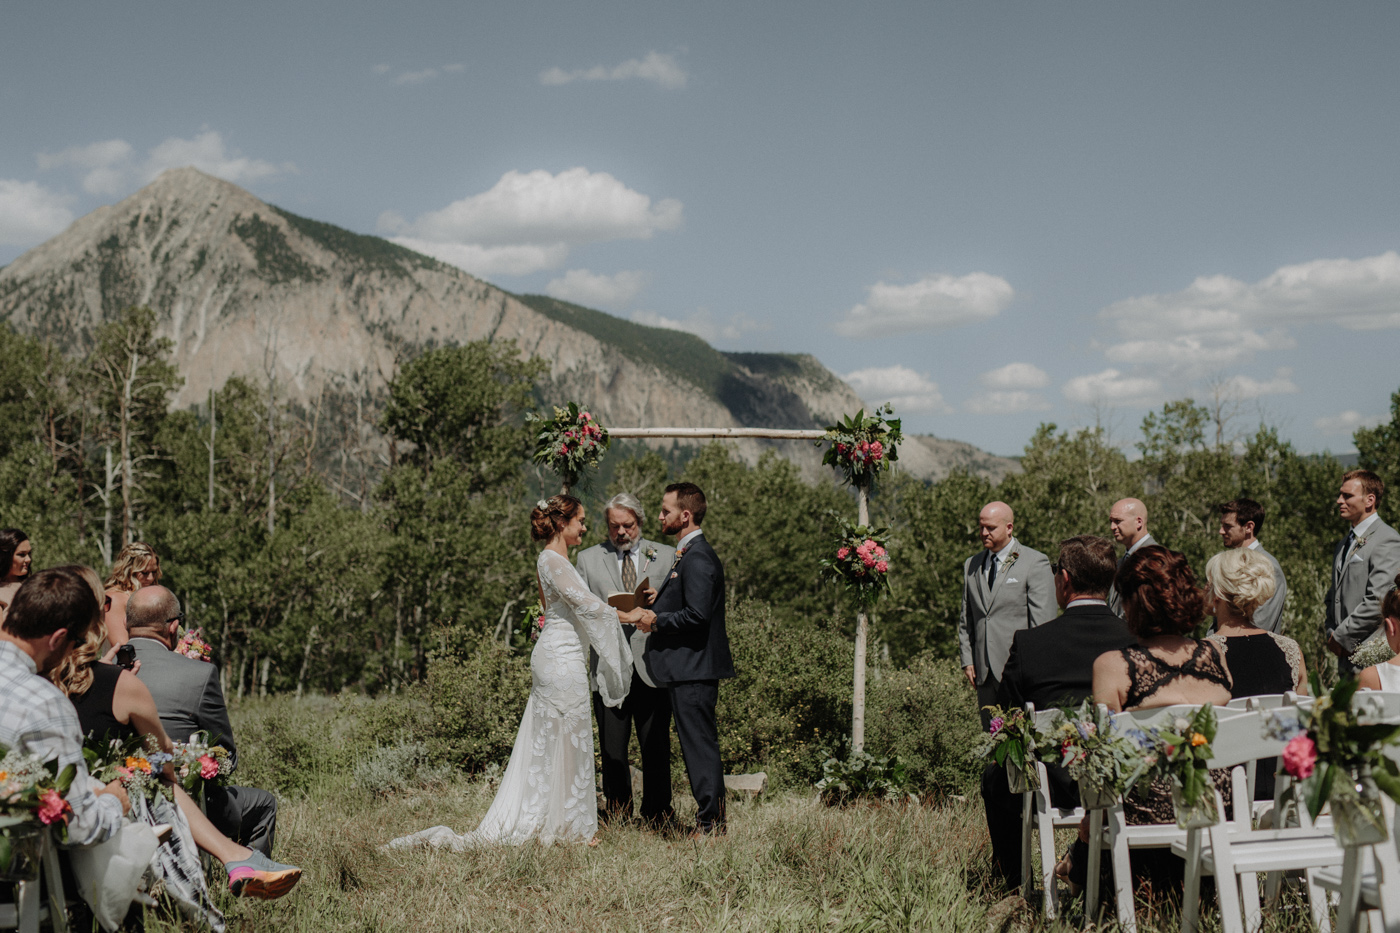 woods-walk-trail-crested-butte-colorado-wedding-46.jpg